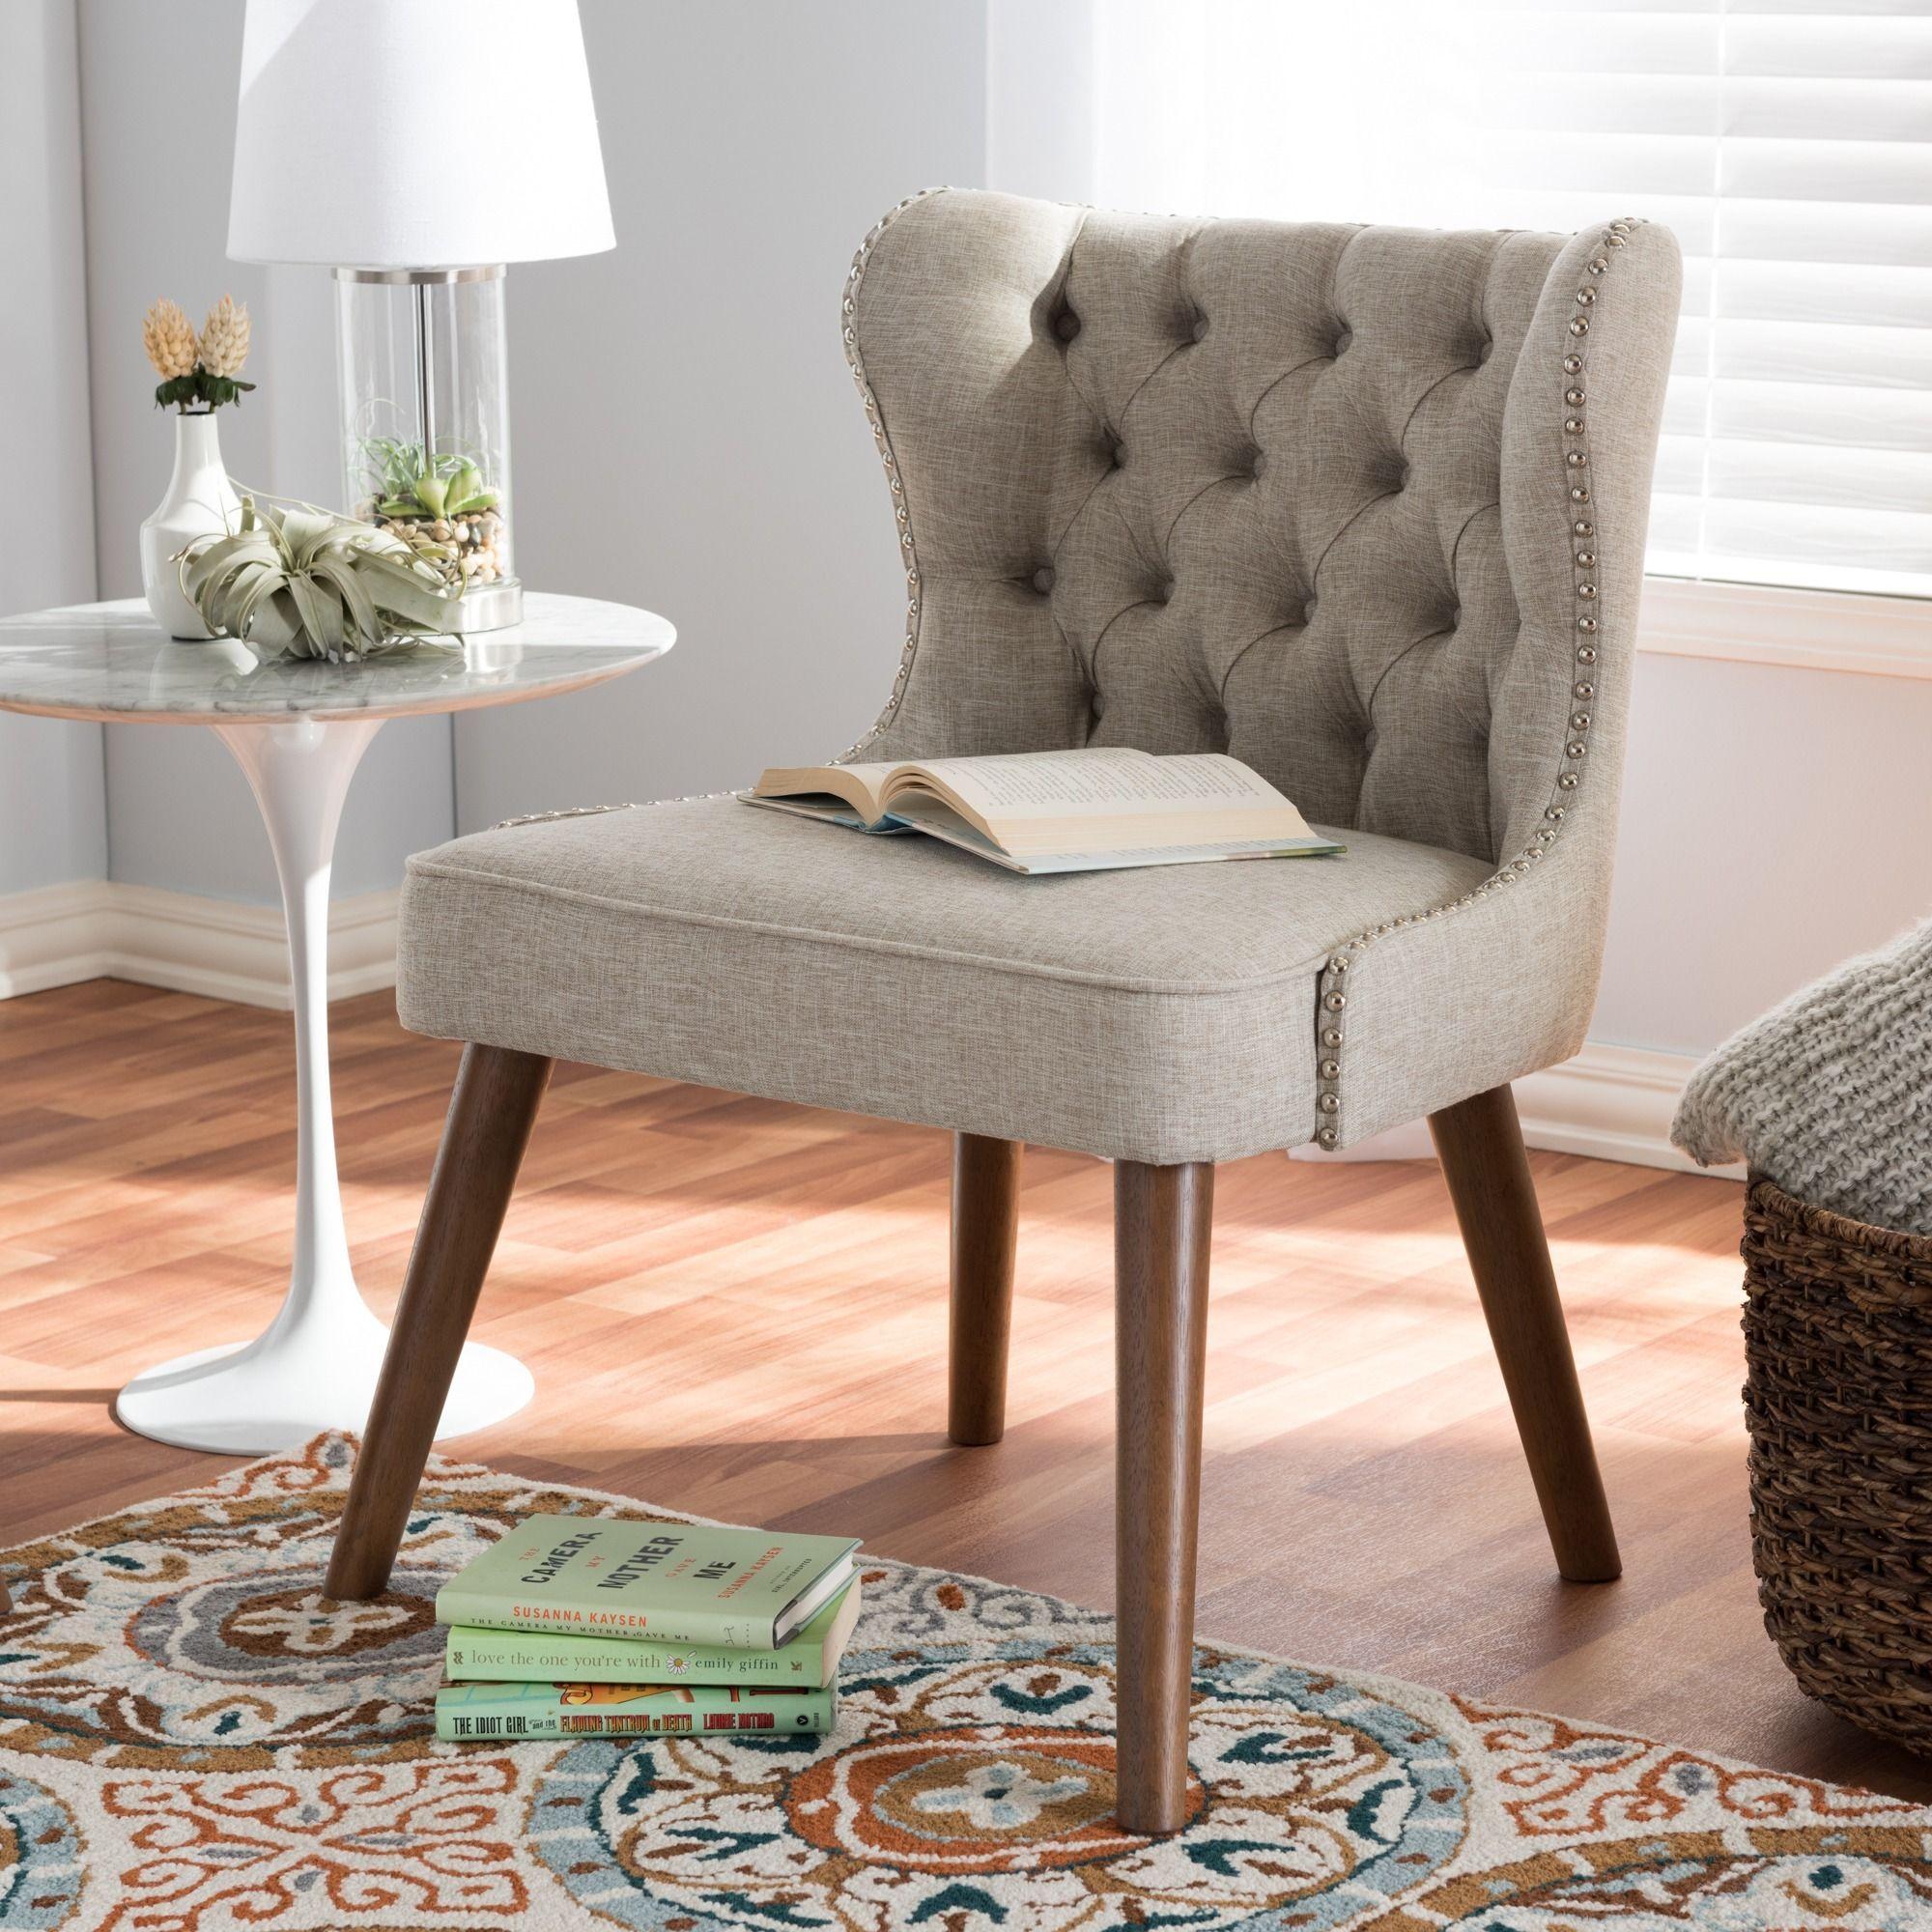 Remarkable Baxton Studio Efthalia Mid Century Modern Upholstered Tufted Cjindustries Chair Design For Home Cjindustriesco